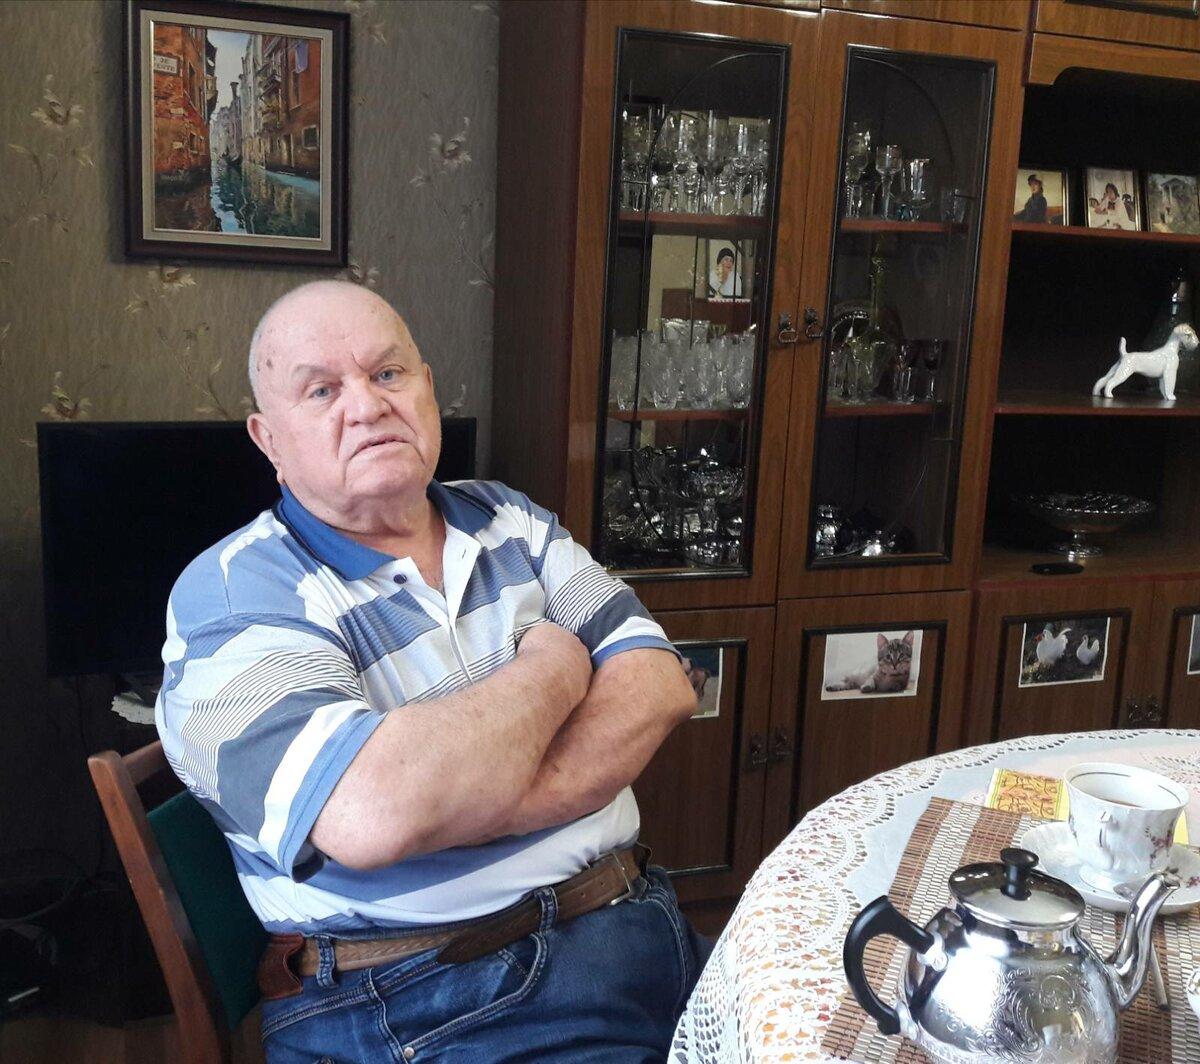 Оренбургский врач-уролог Александр Григорьевич Шпикалов. Фото Инны Ломанцовой.